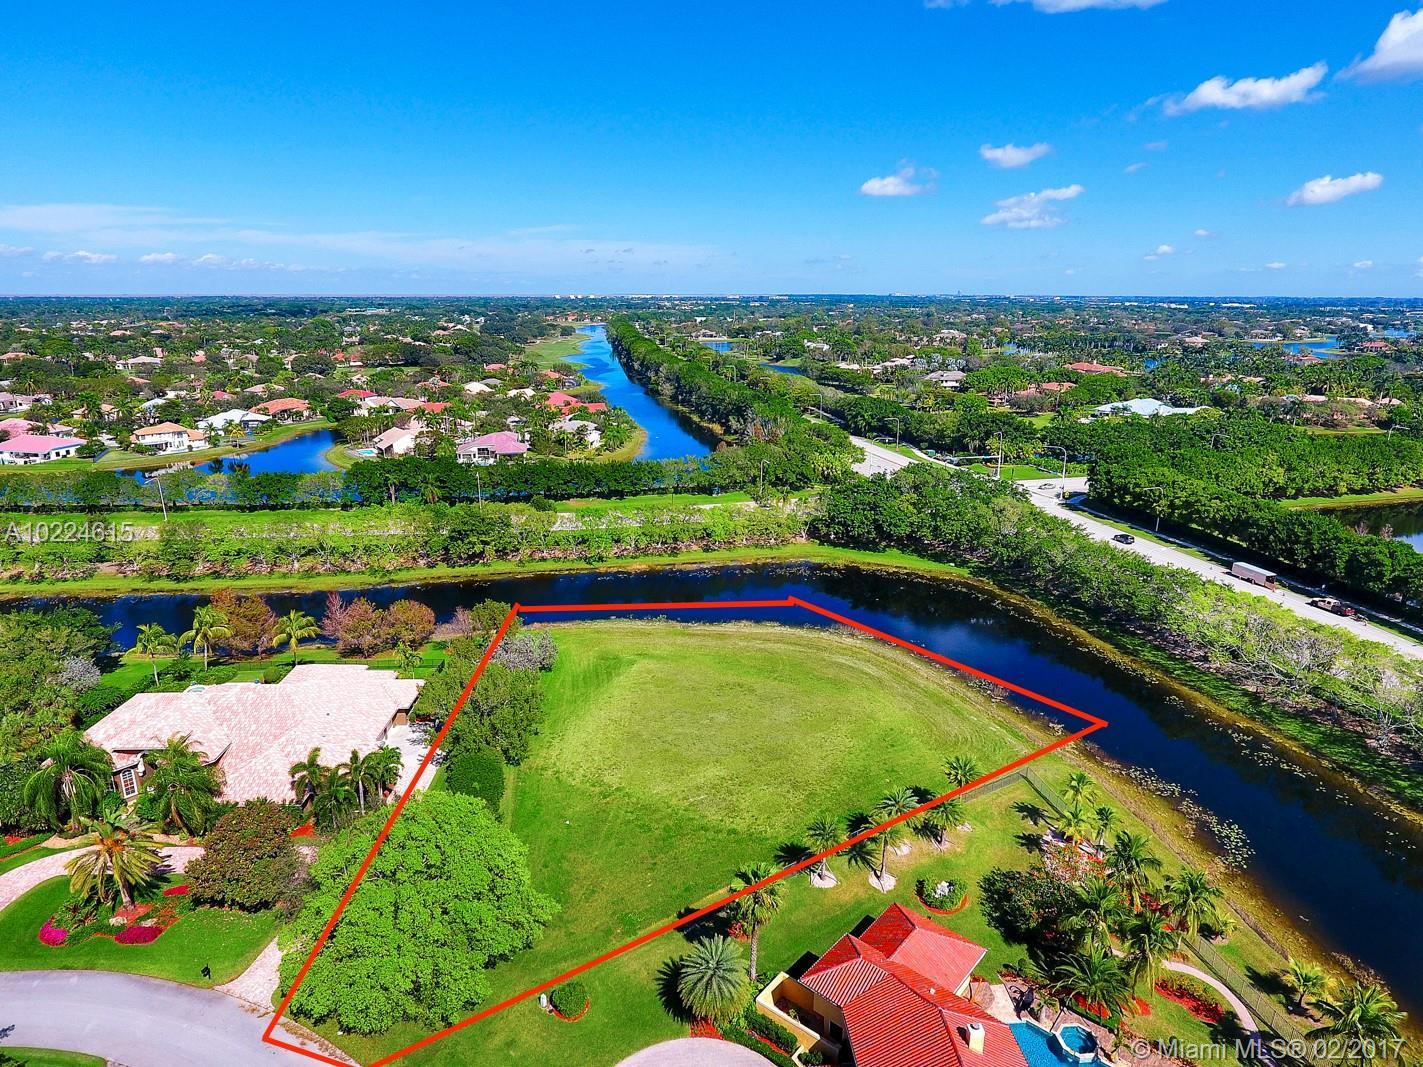 3764 Pine Lake Dr, Weston FL, 33332